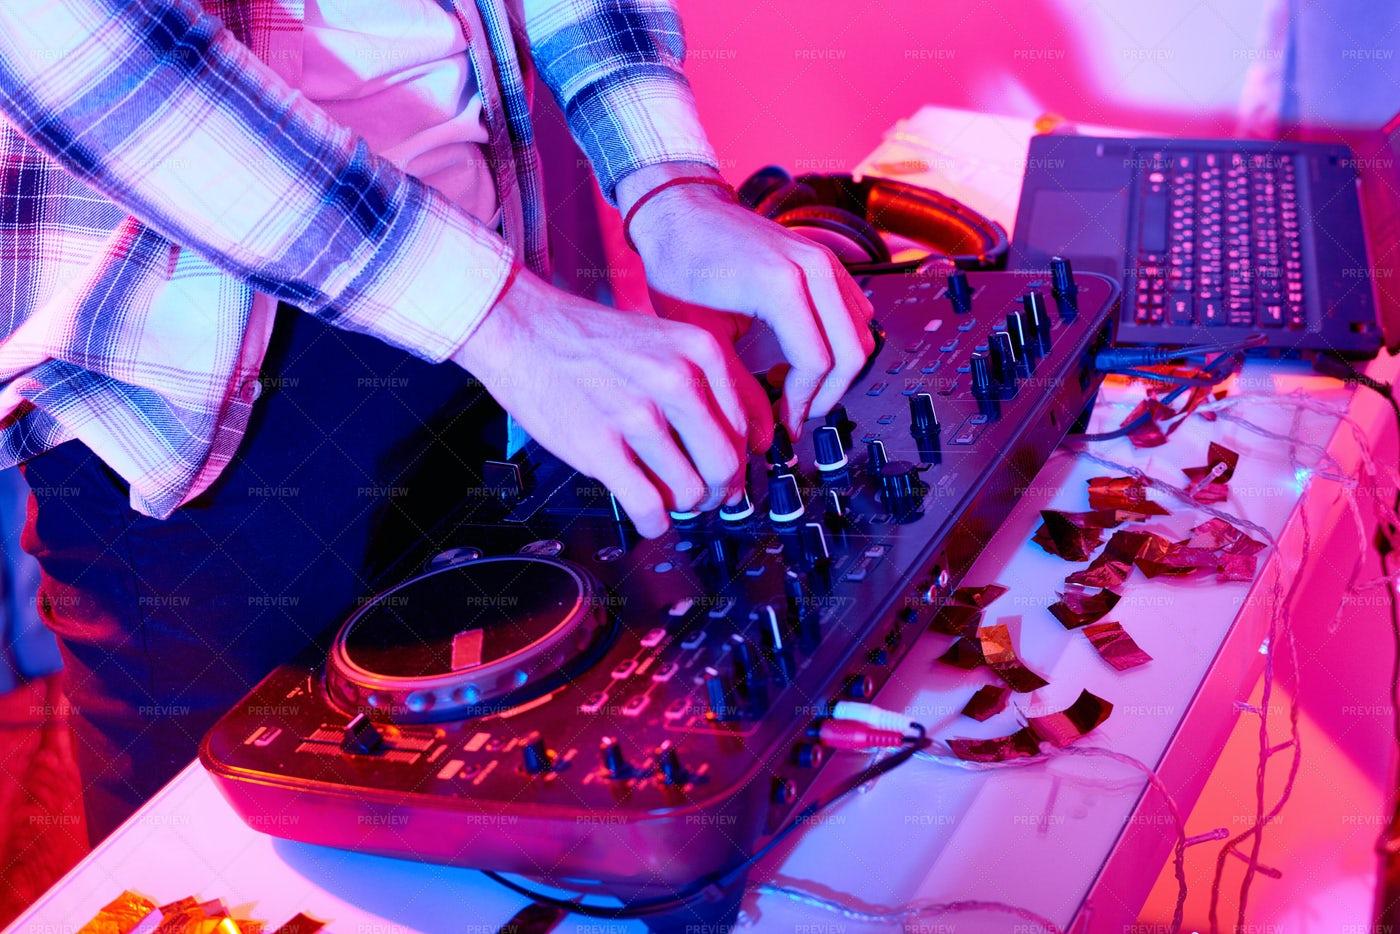 Crop DJ Mixing On Console: Stock Photos